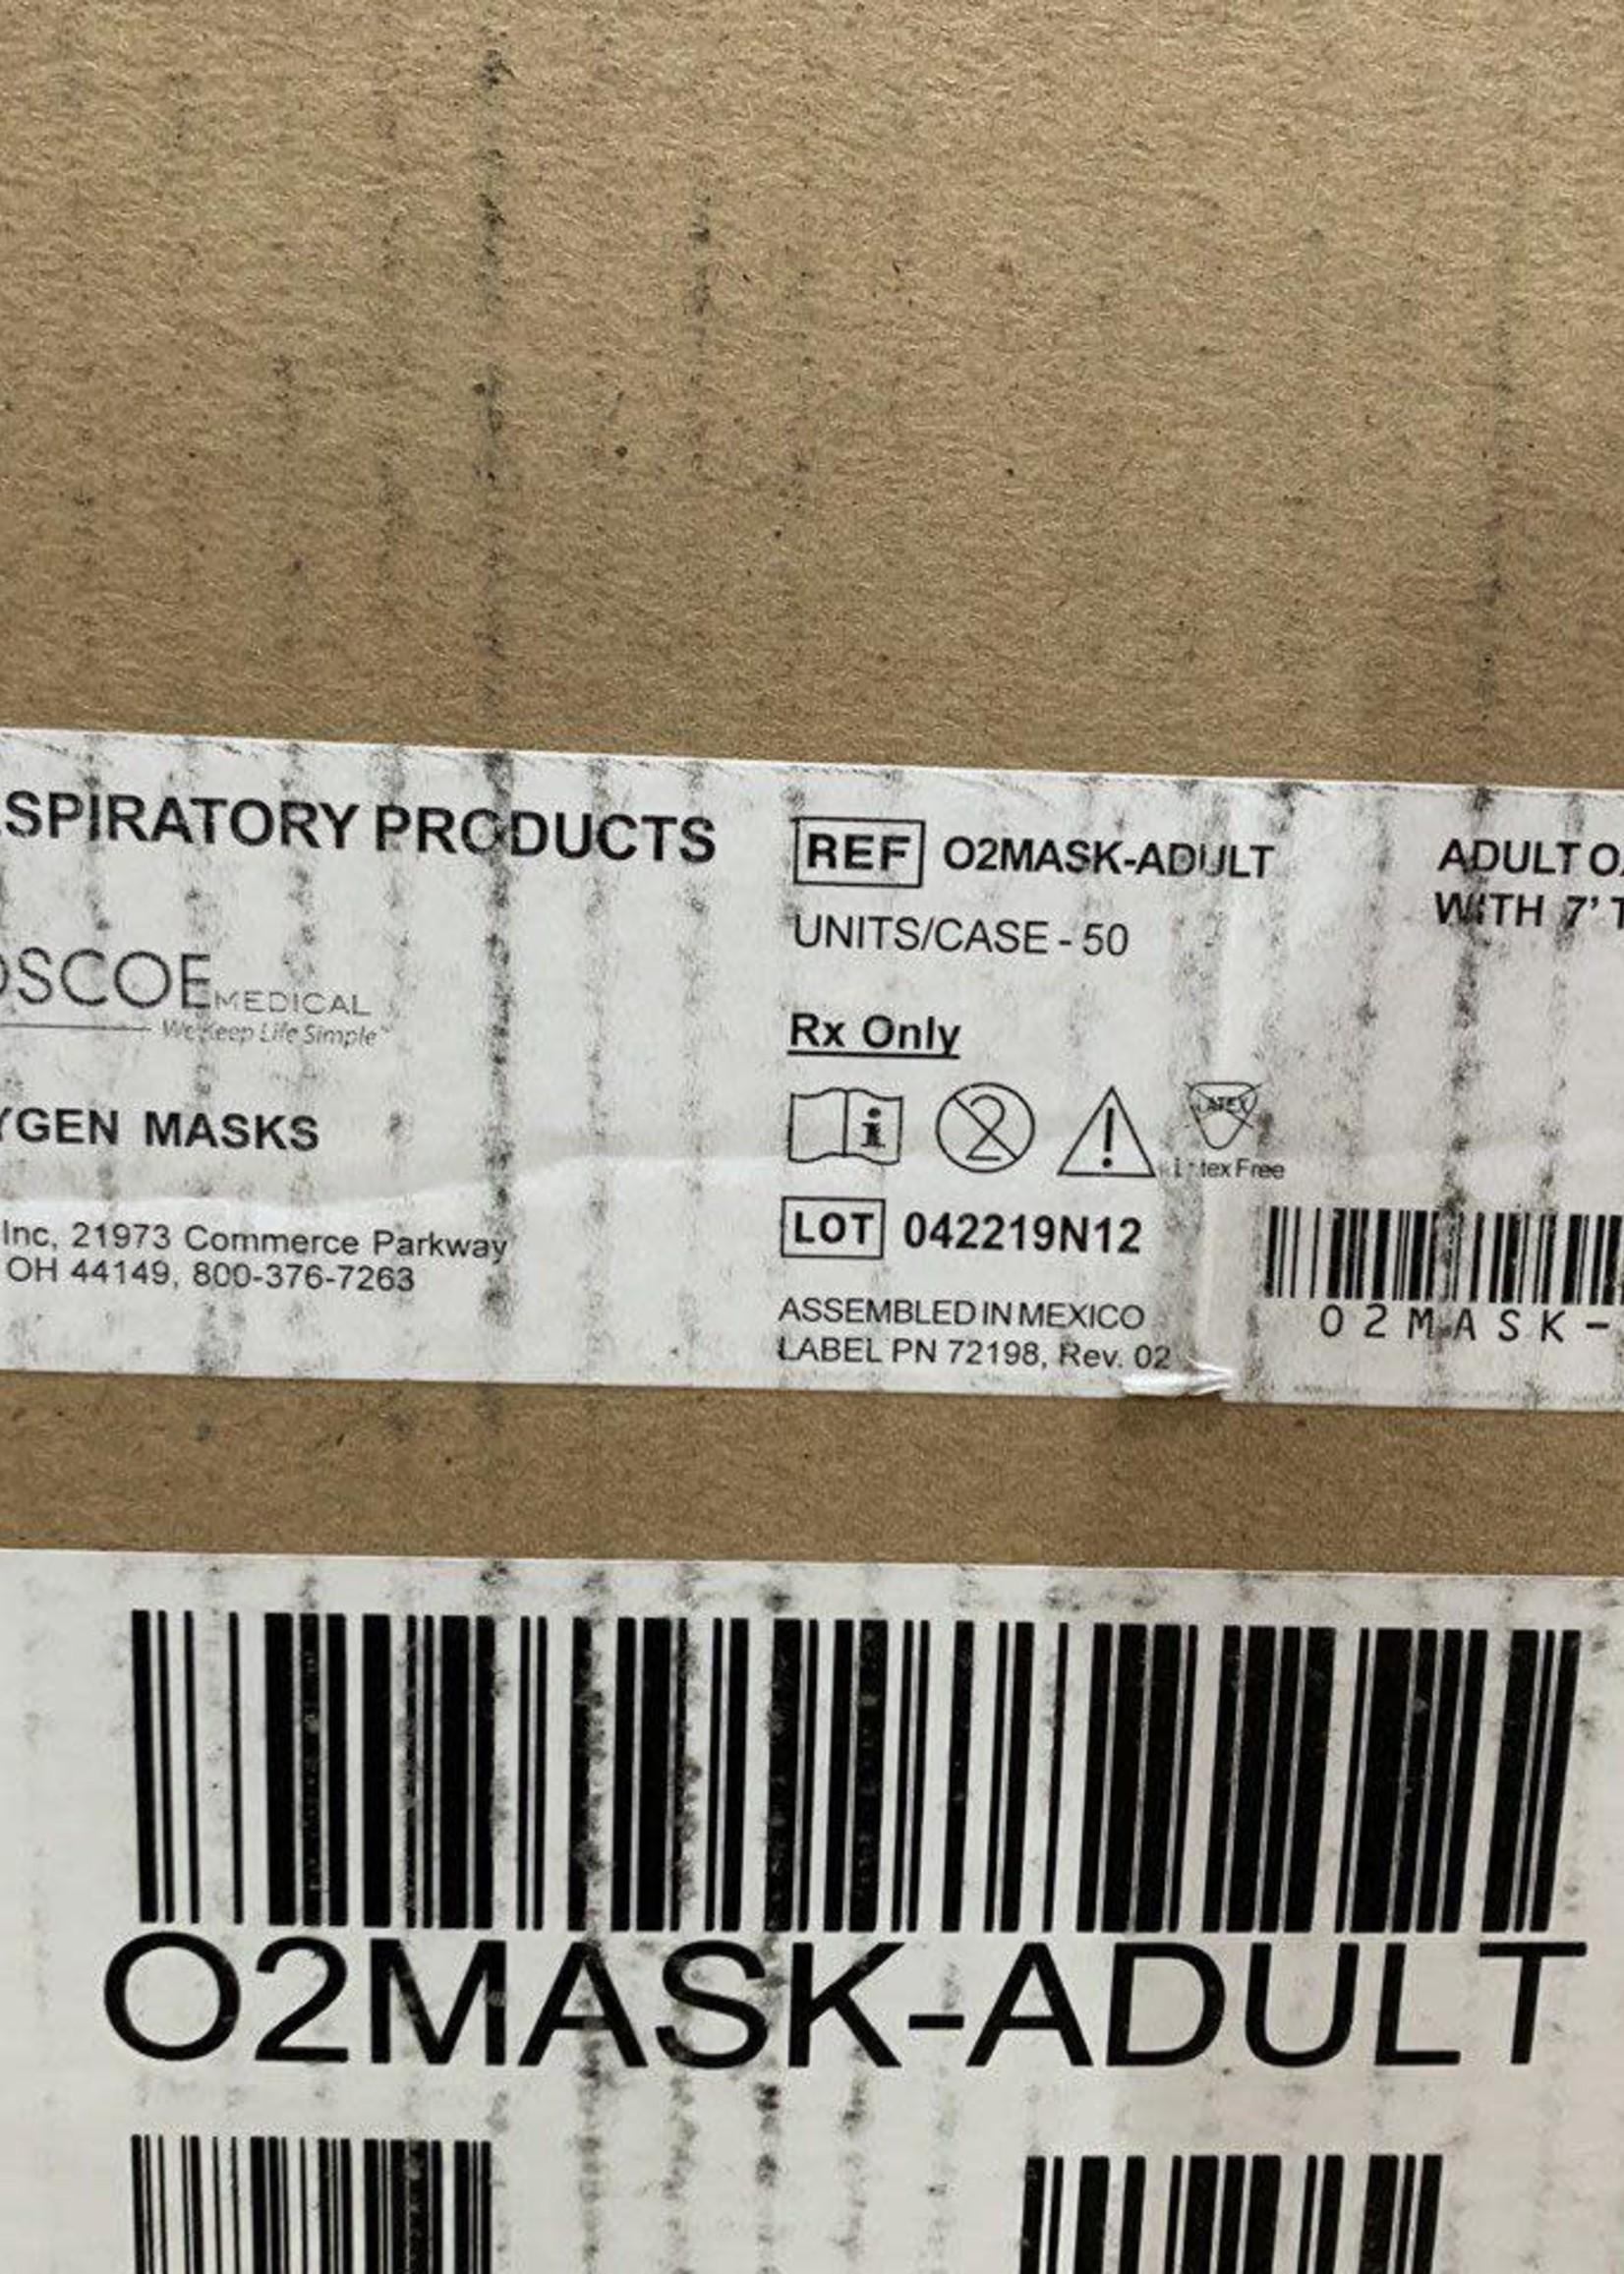 A Box of Adult Oxygen Masks